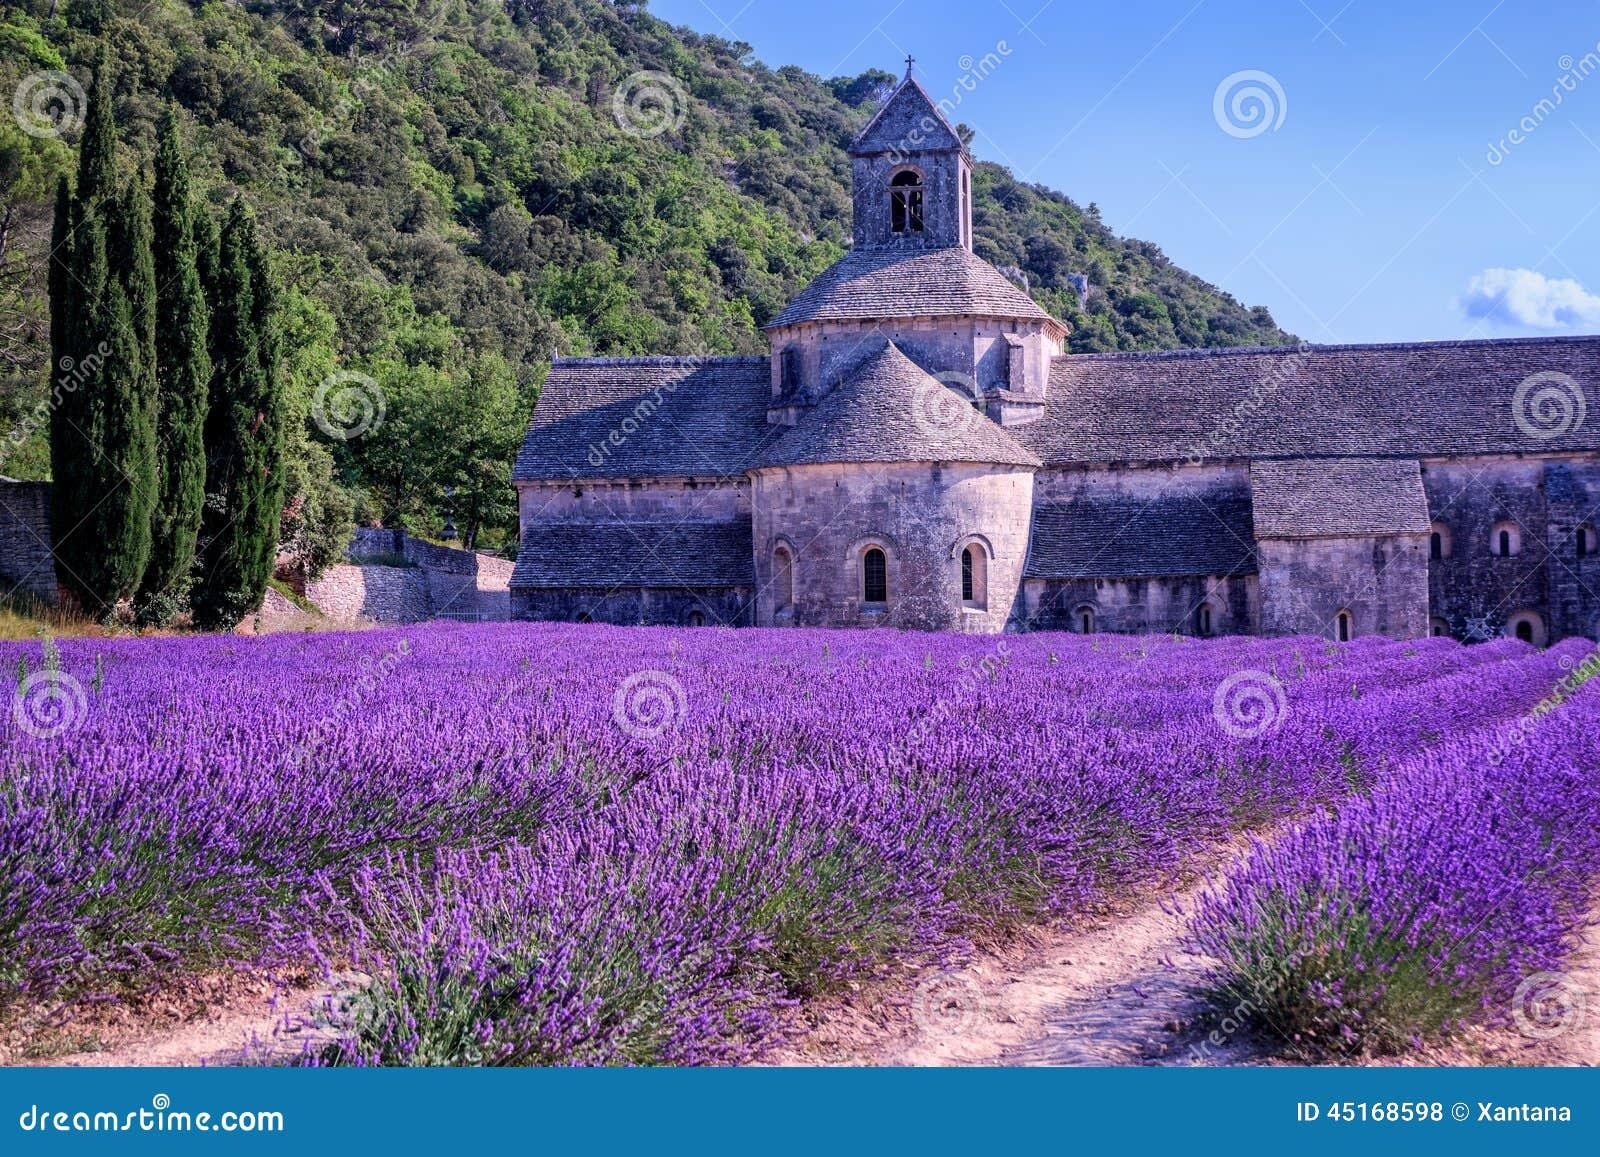 Lavendelfelder frankreich stockfoto bild von lavendel for Lavendelfelder provence